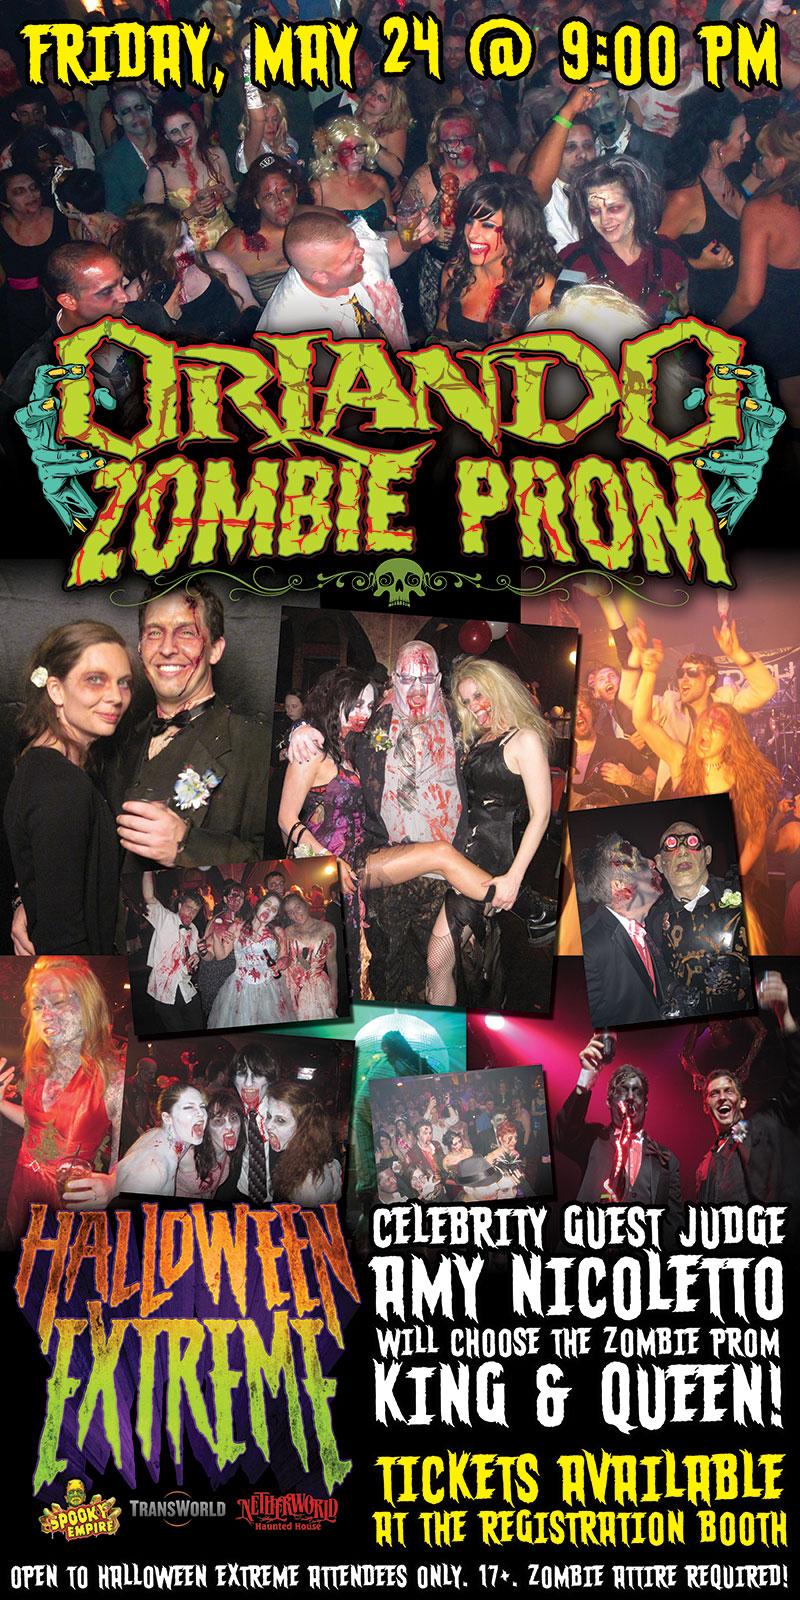 Orlando Zombie Prom